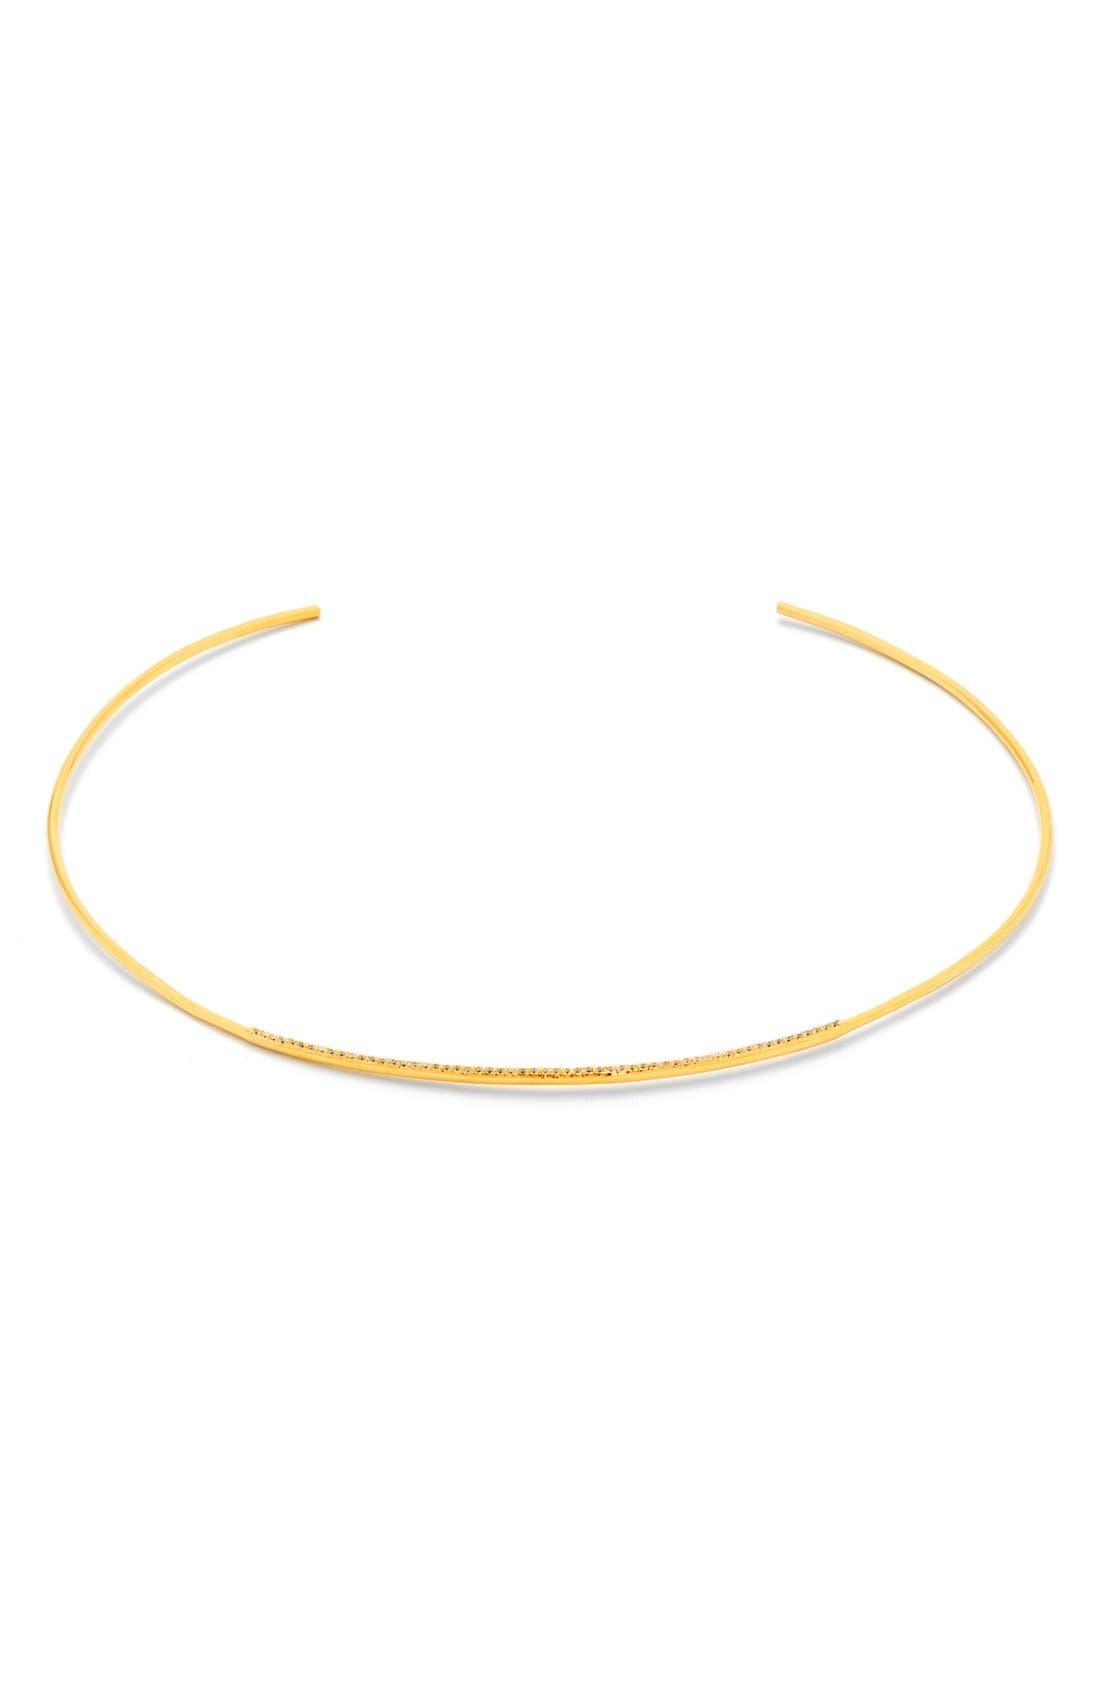 Main Image - gorjana 'Petra' Pavé Choker Necklace